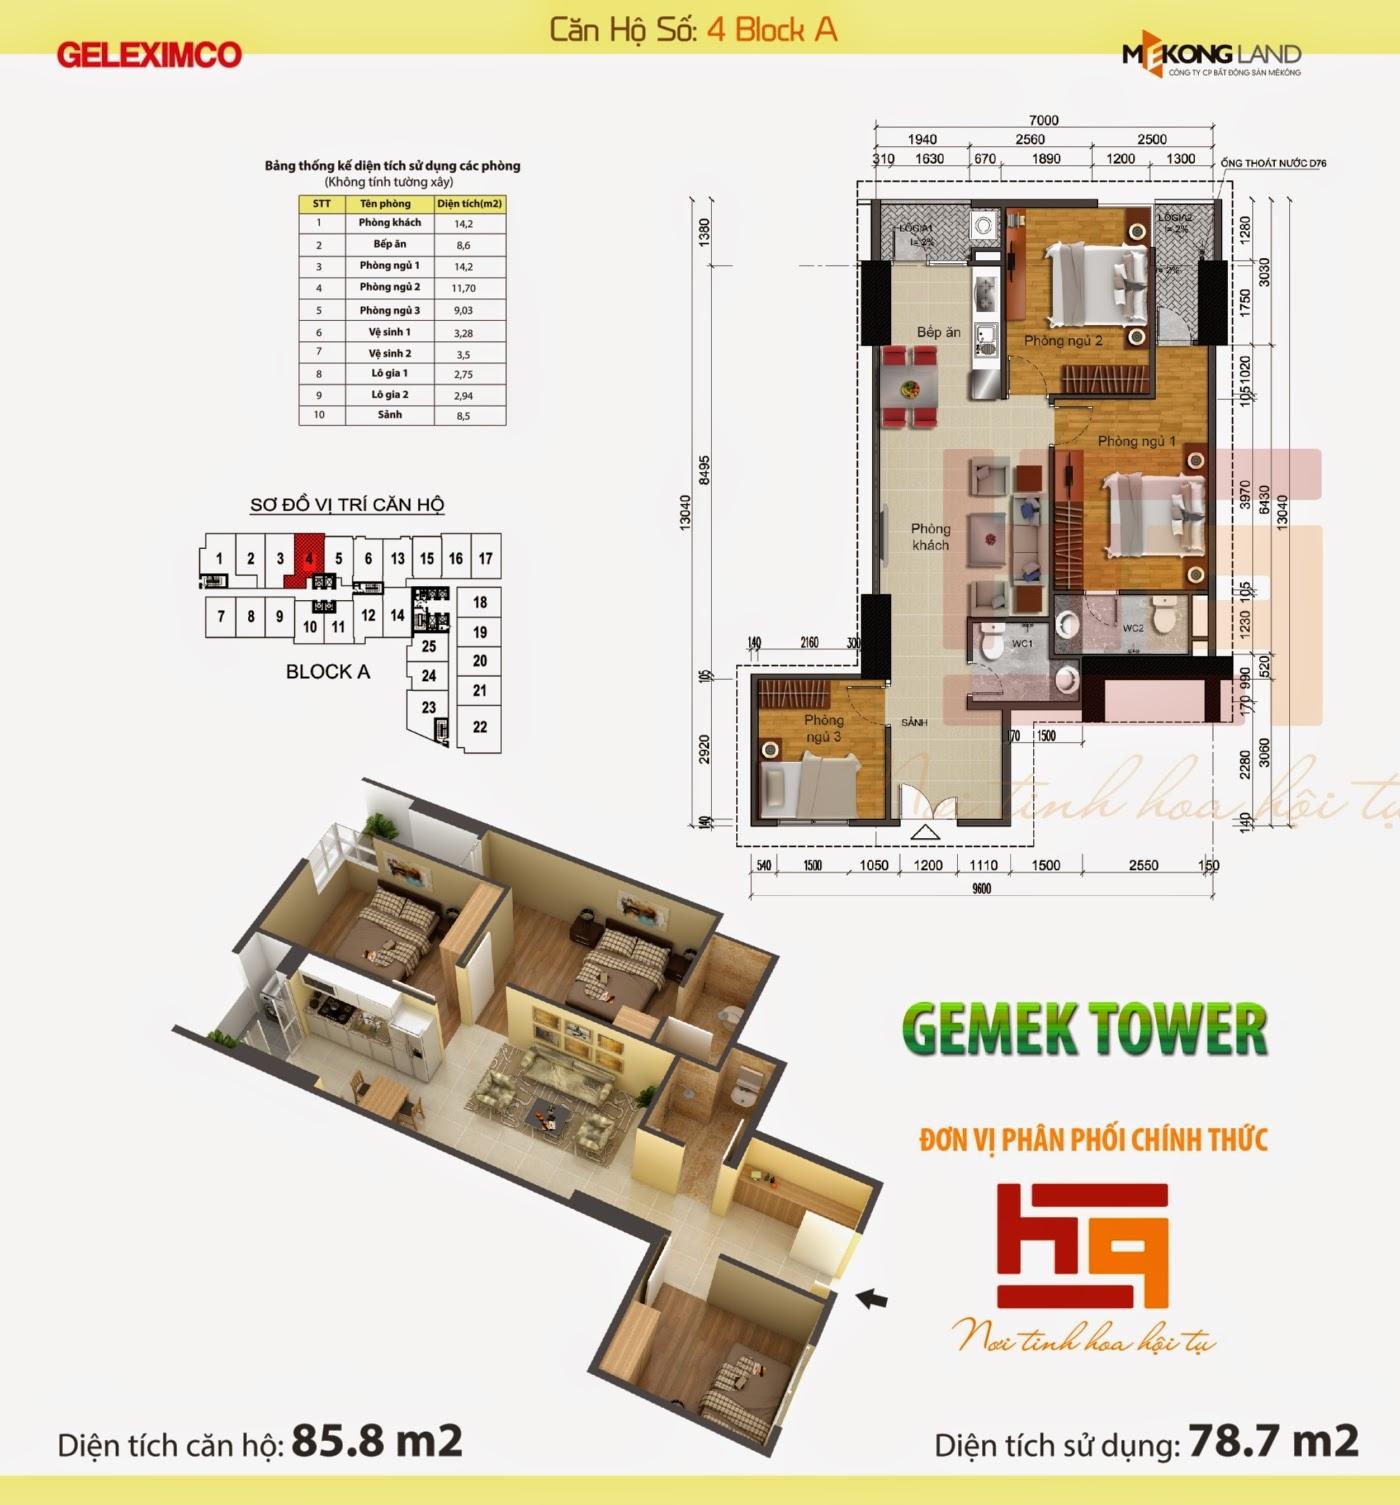 gemek-tower-can-4